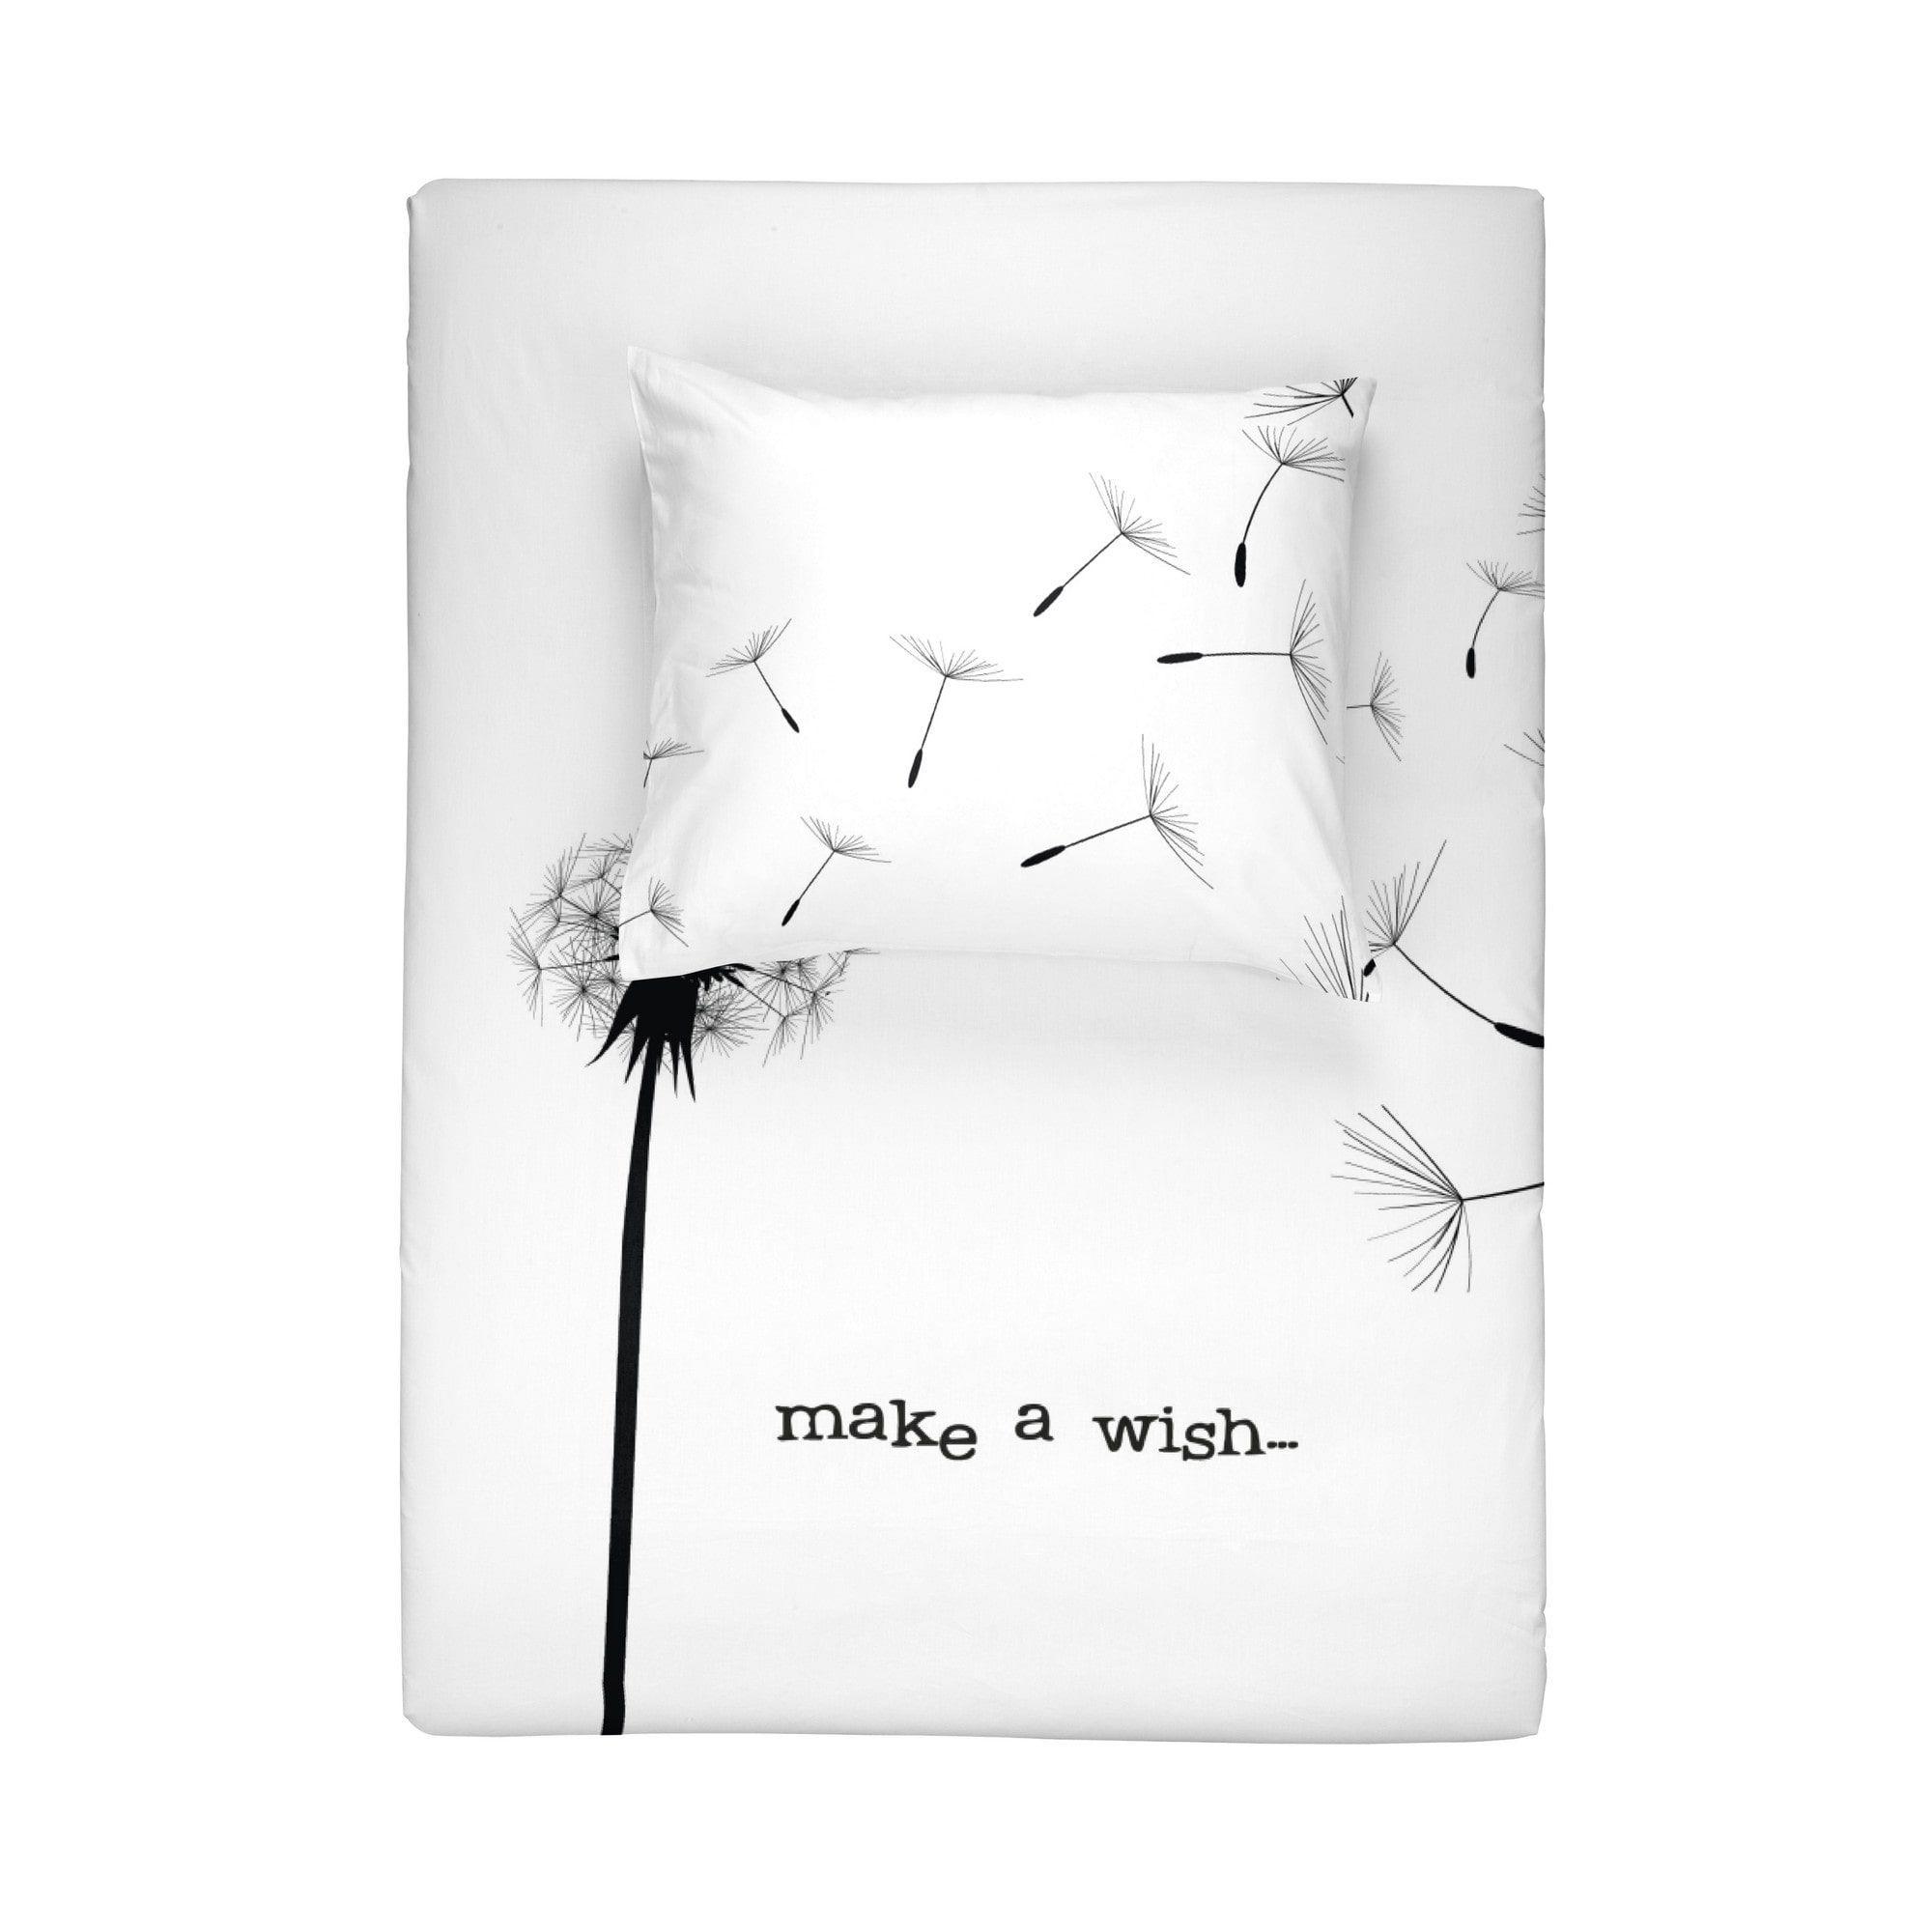 Dagaanbieding - Walra Make a Wish dekbedovertrek dagelijkse koopjes